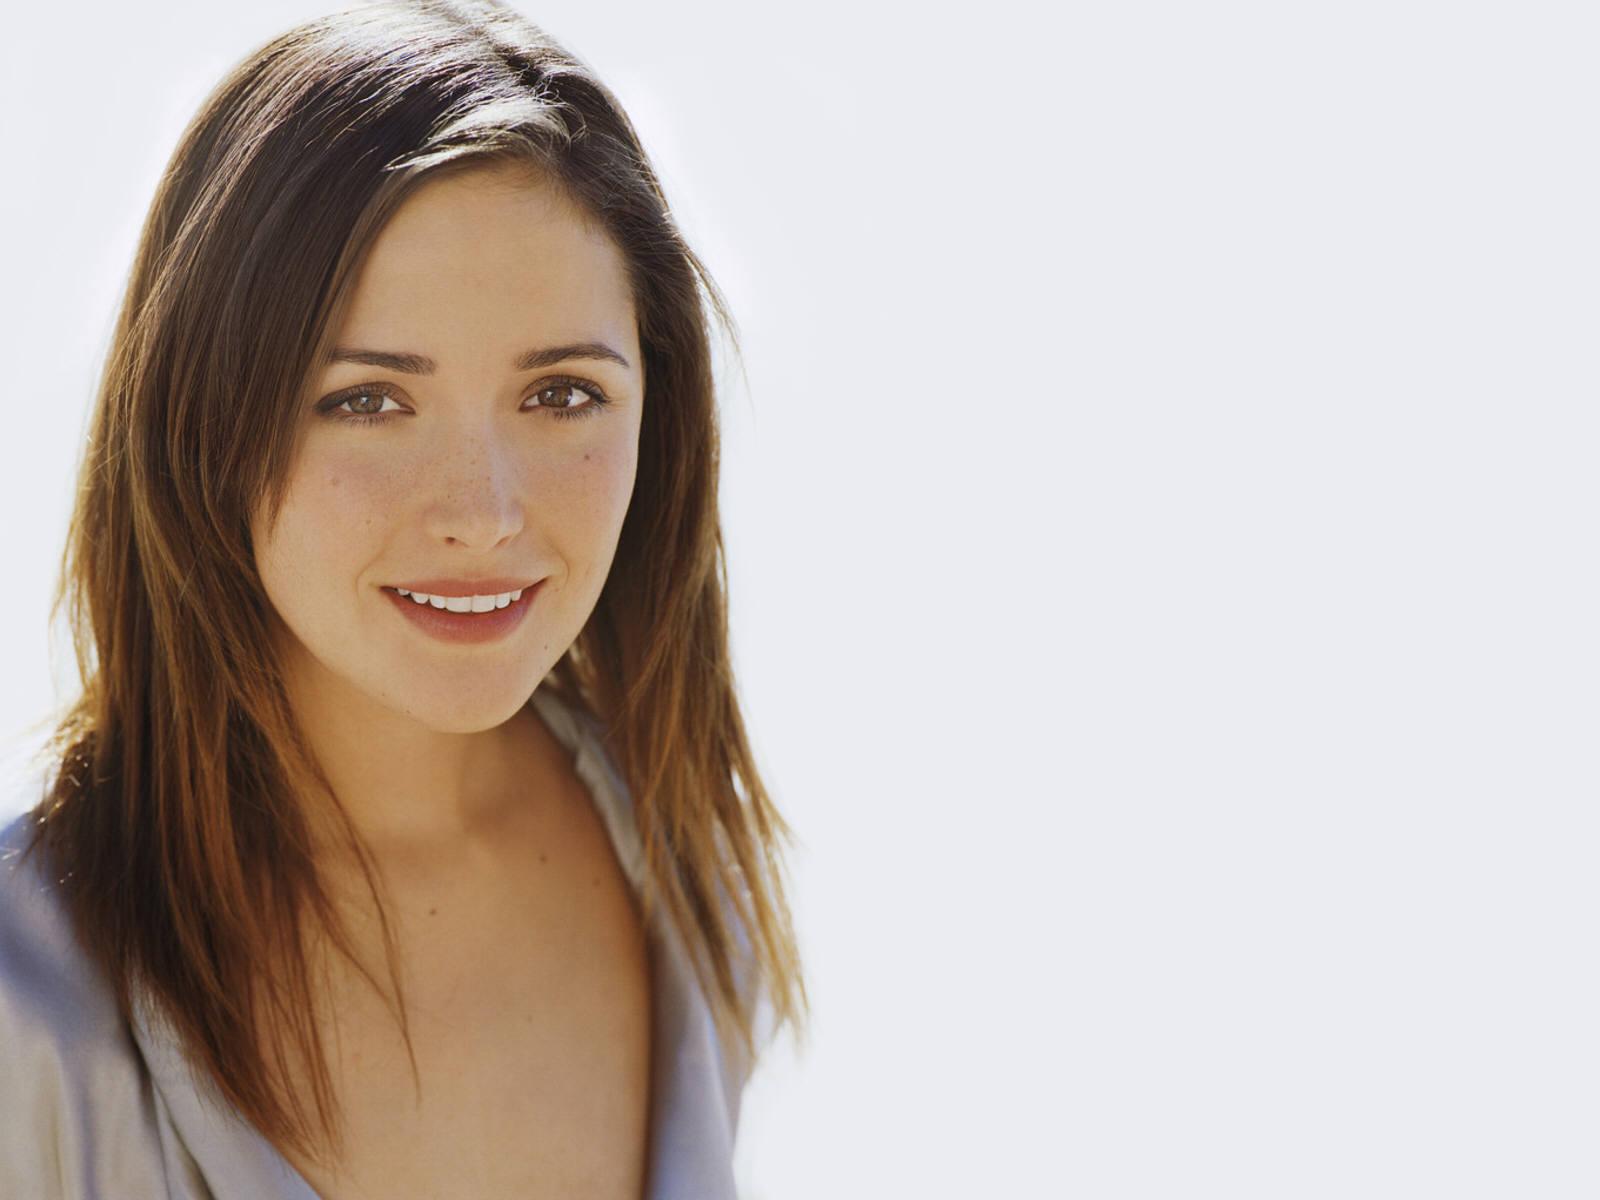 australian movies star rose byrne